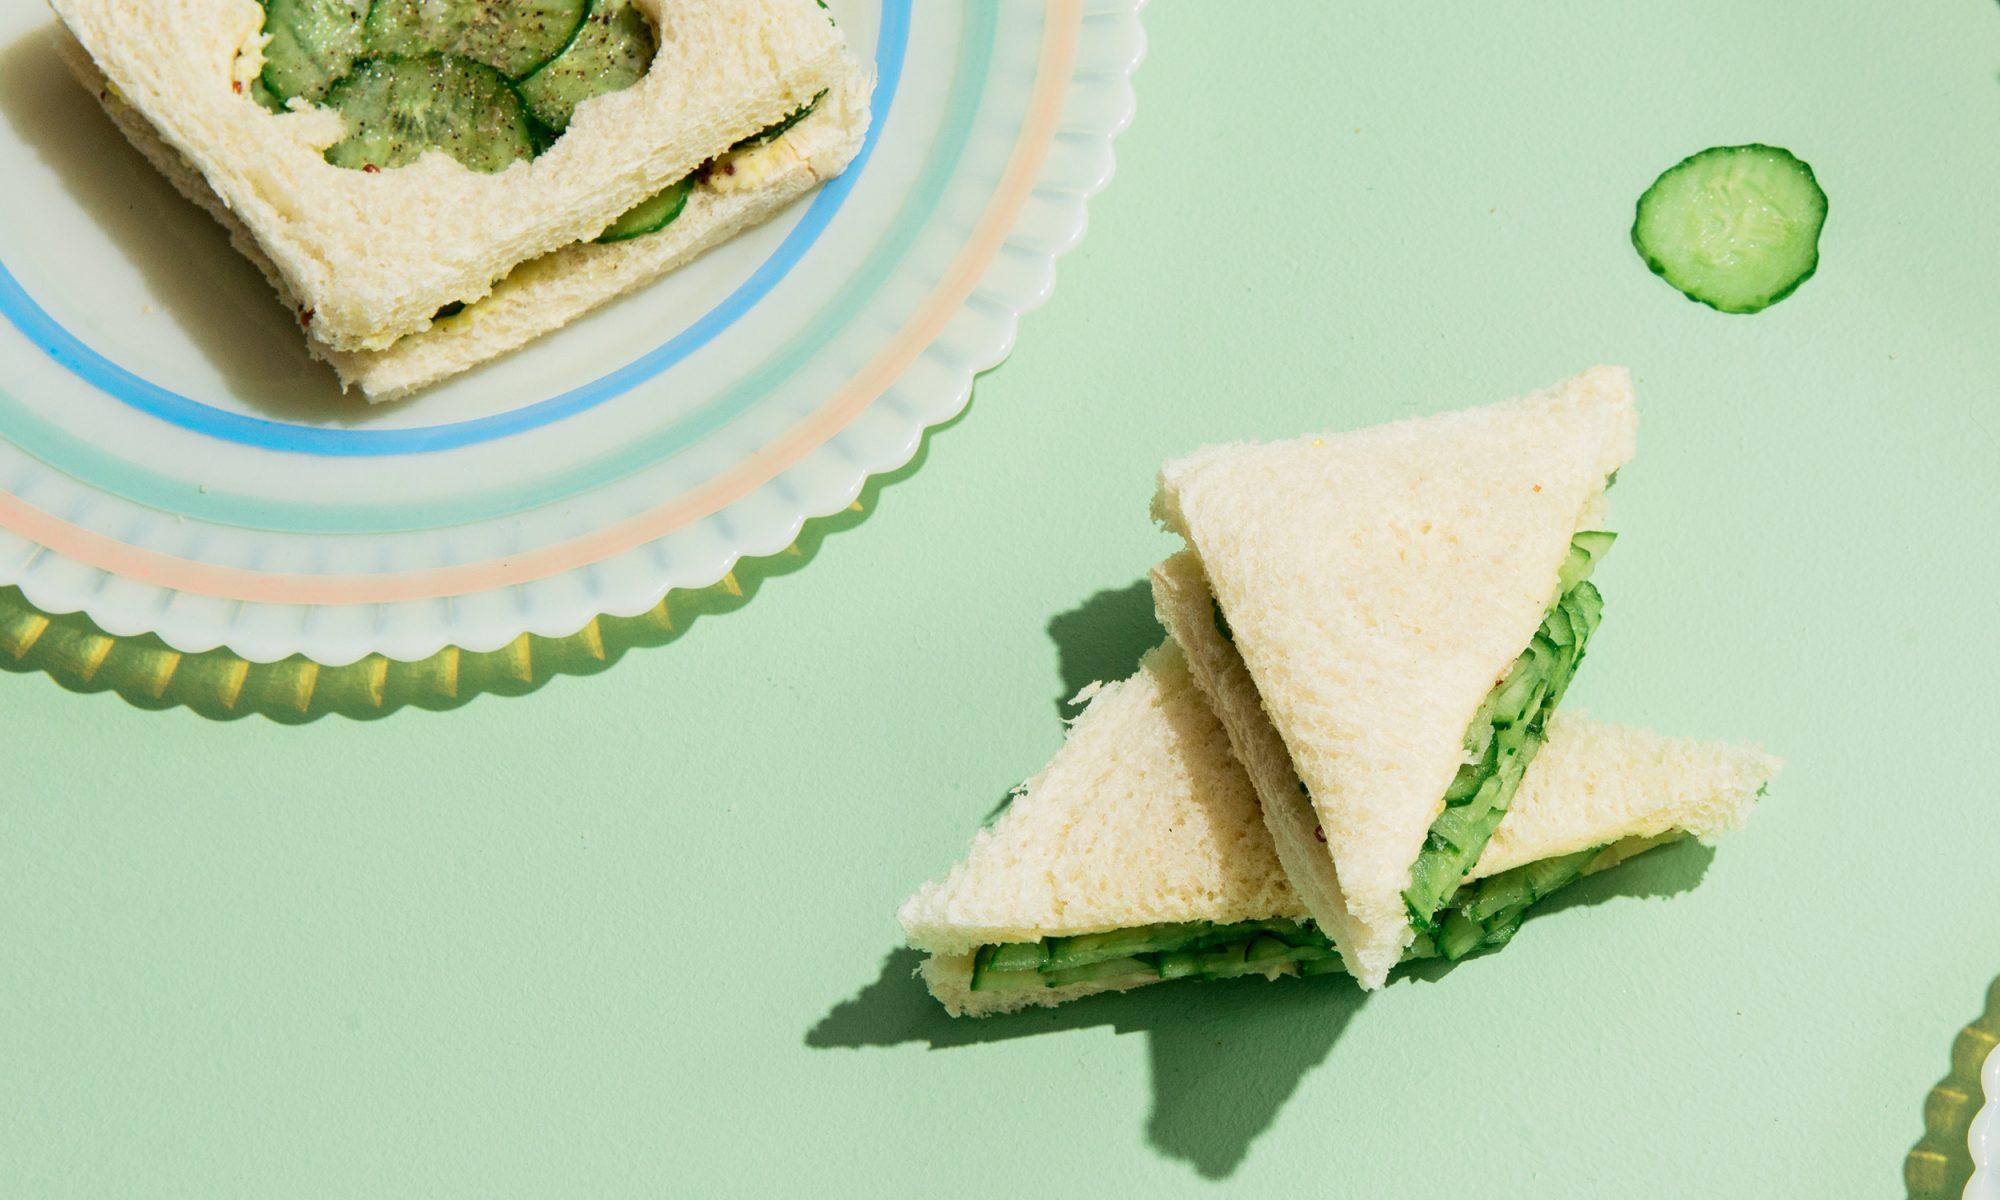 EC: Cucumber Sandwiches for Fancy Times